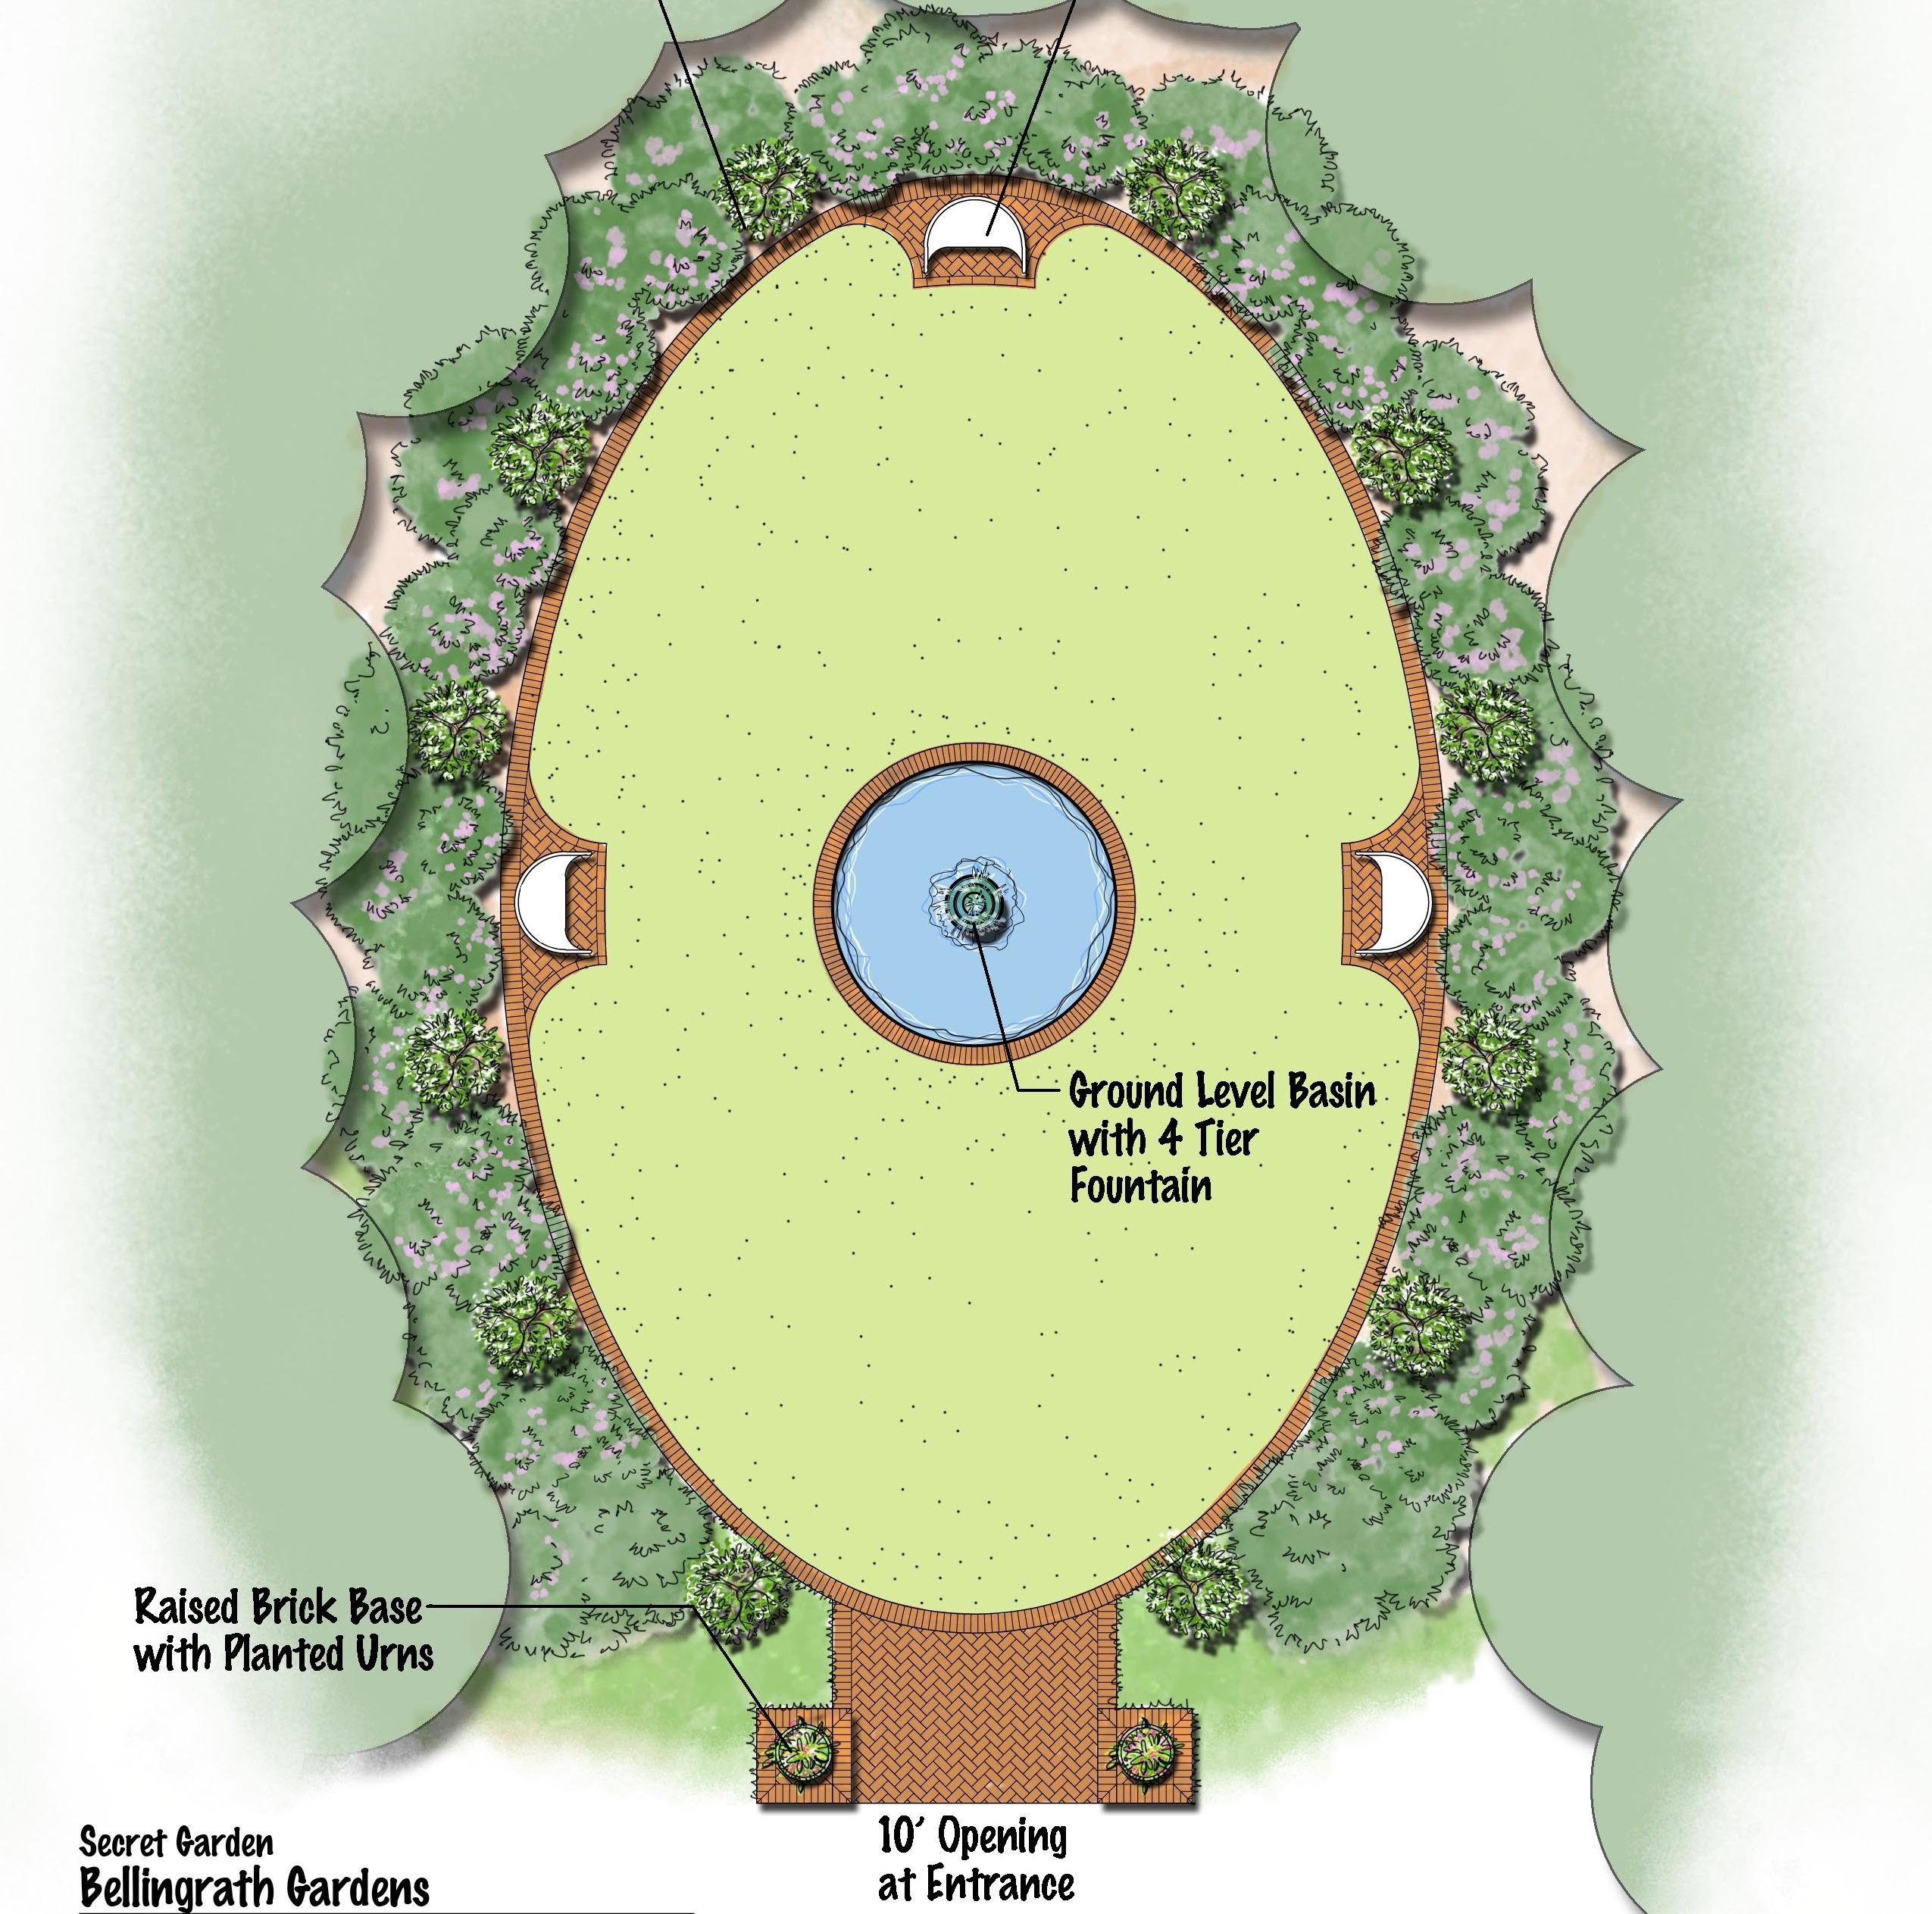 The Secret Garden A new place of serenity Bellingrath Gardens